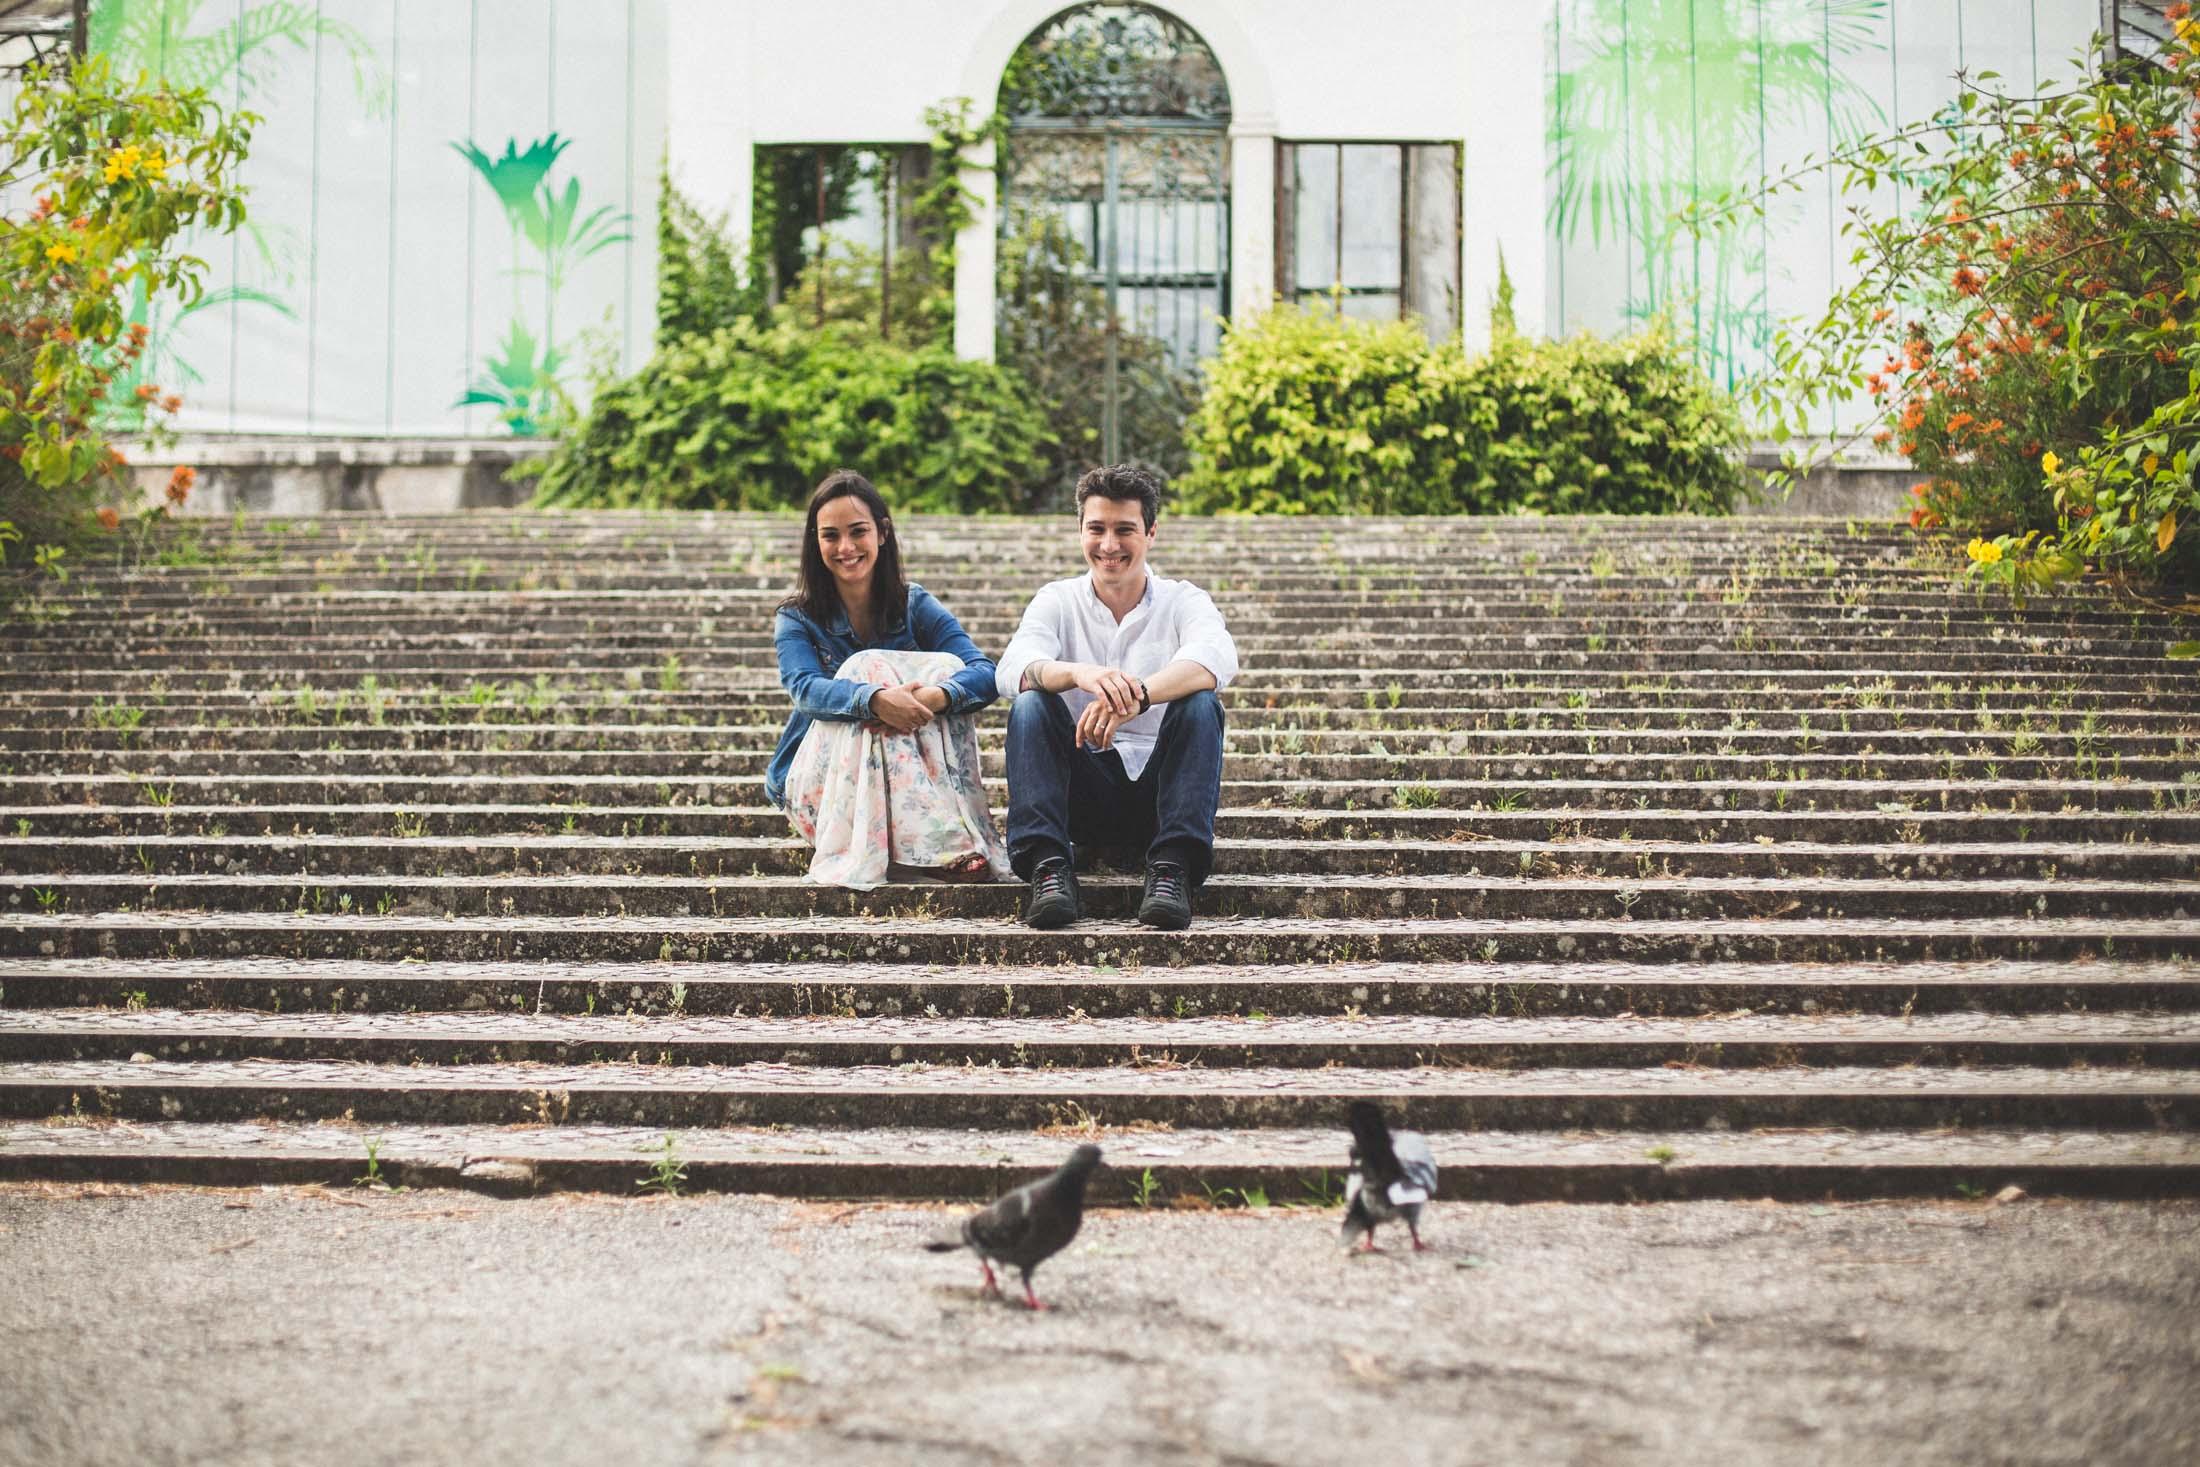 10 engagement-love-session-fundacao-Champalimaud-Filipe-Santiago-Fotografia-Lisboa-Mafra-Malveira-Fotografo